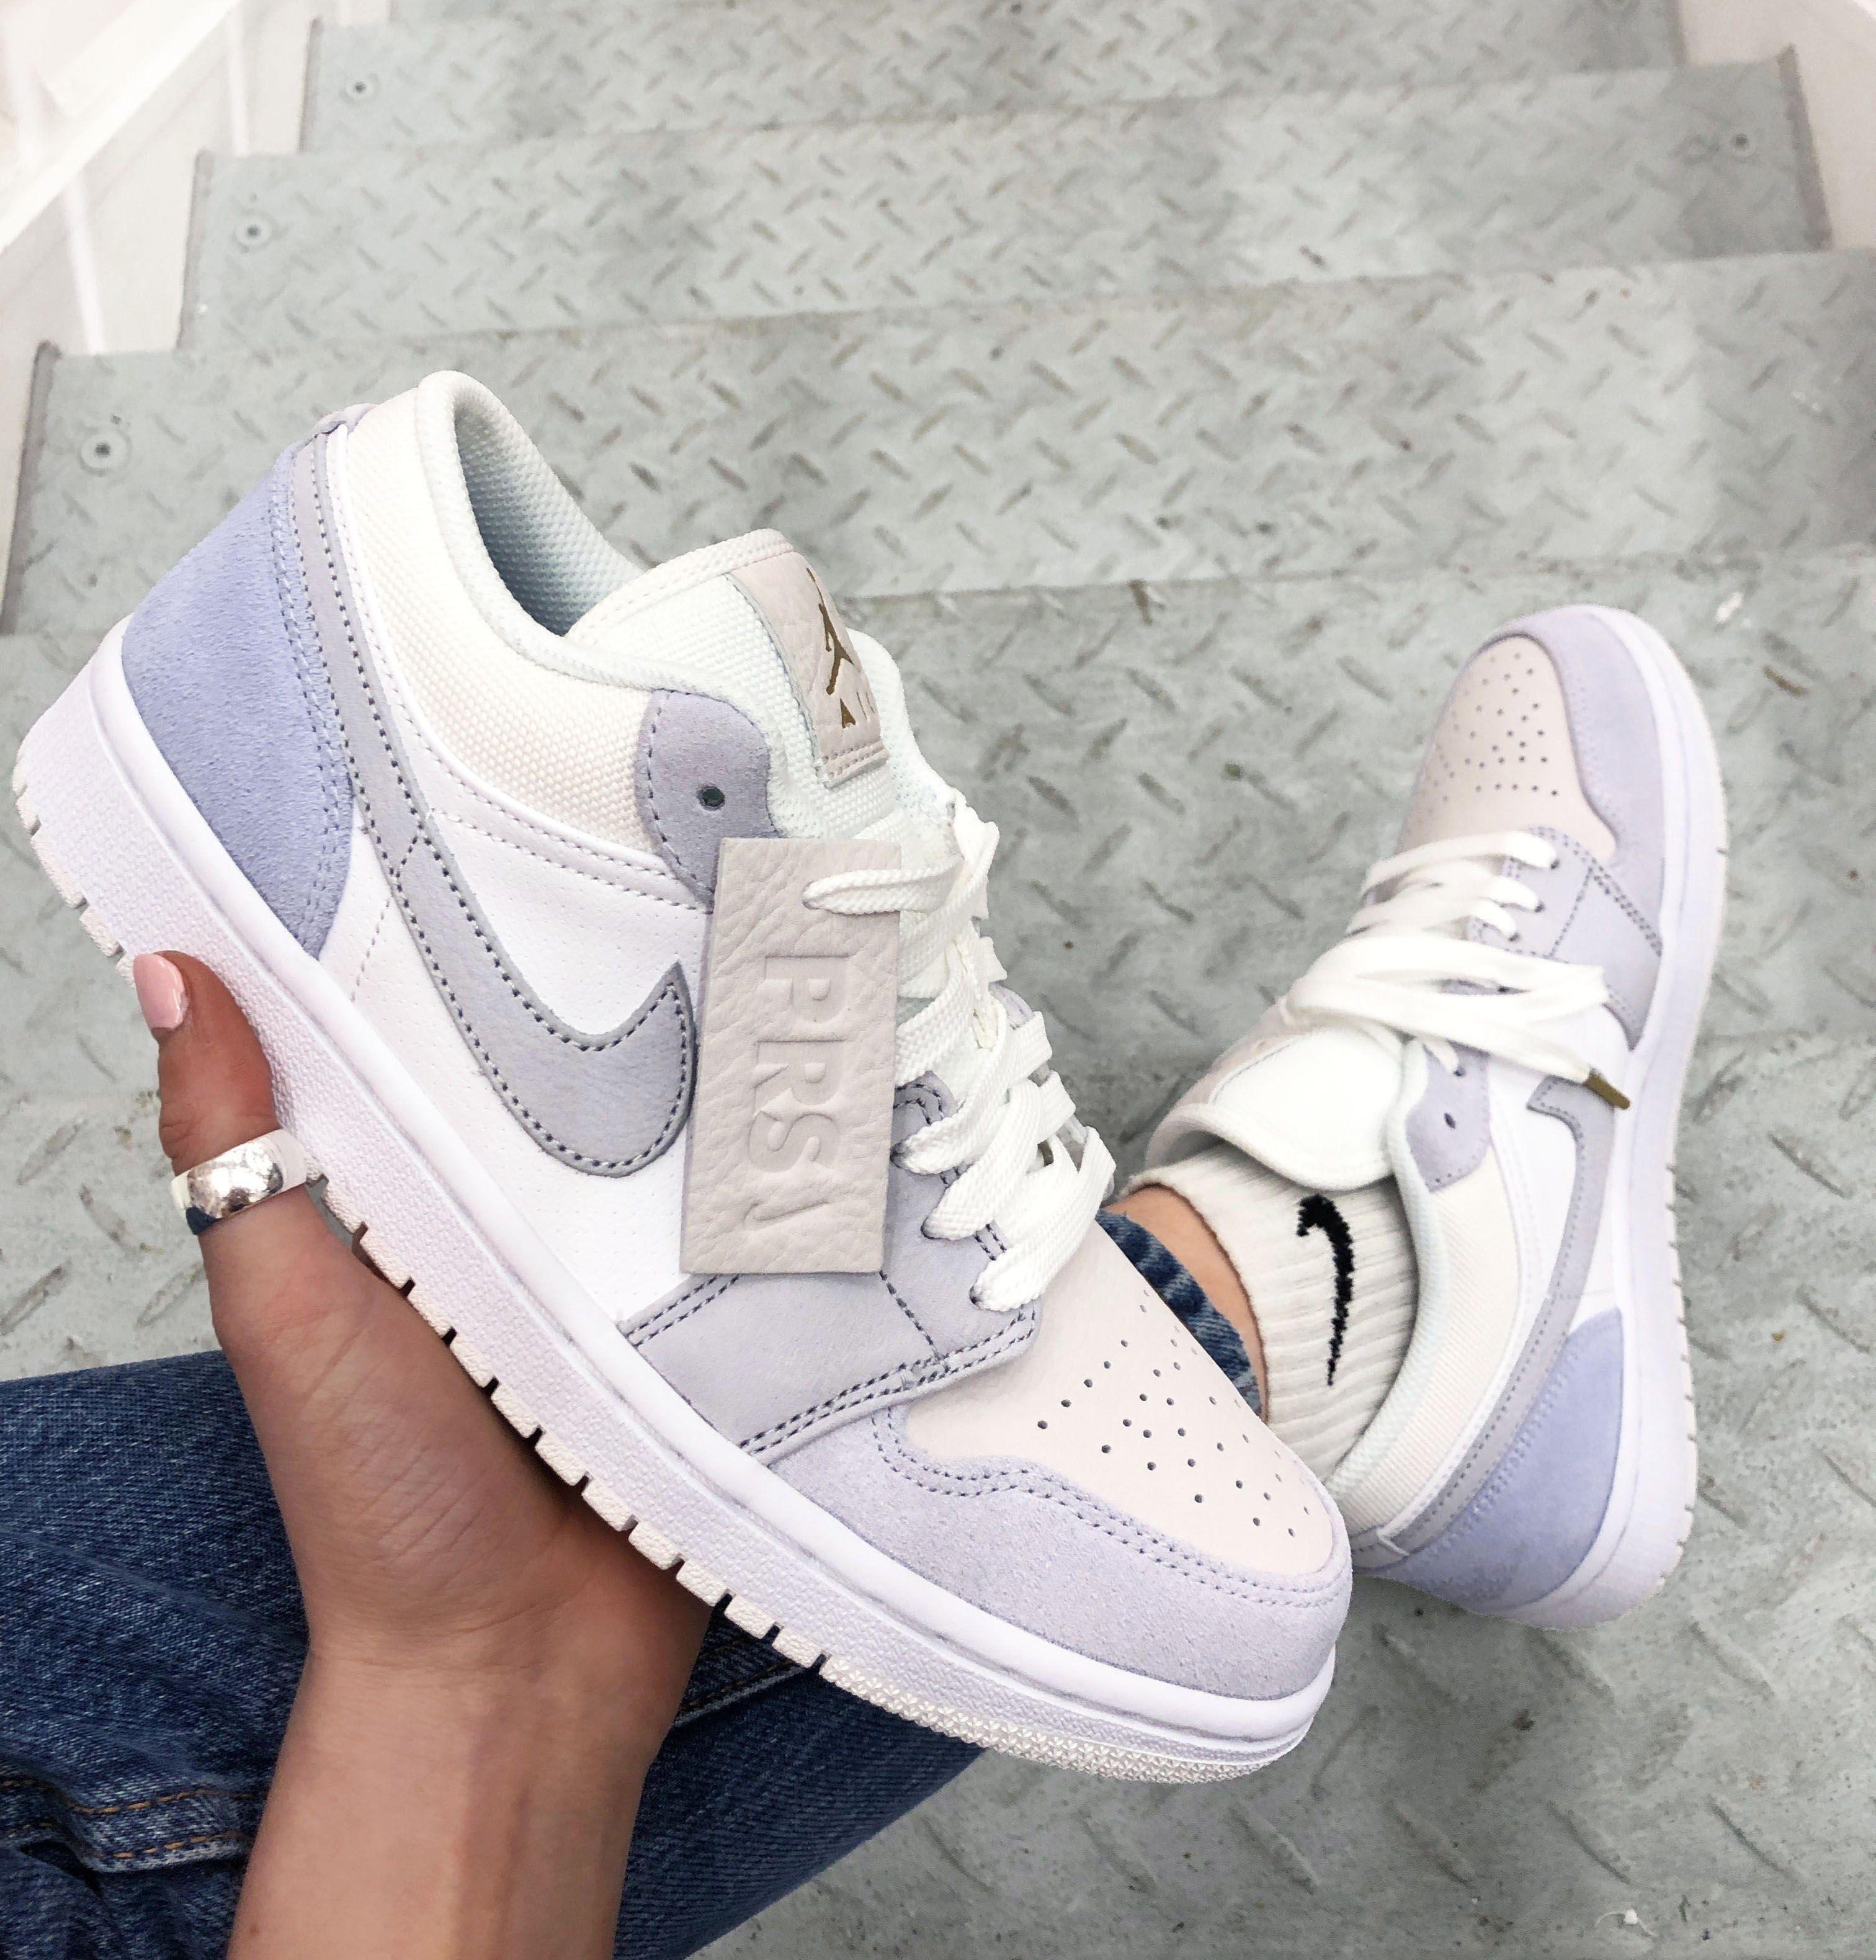 Jordan 1 Low Paris Style Women Jordan Paris Style Women Zapatosbajos Zapatosbon Zapatos Nike Mujer Zapatos Nike Para Damas Zapatos Tenis Para Mujer